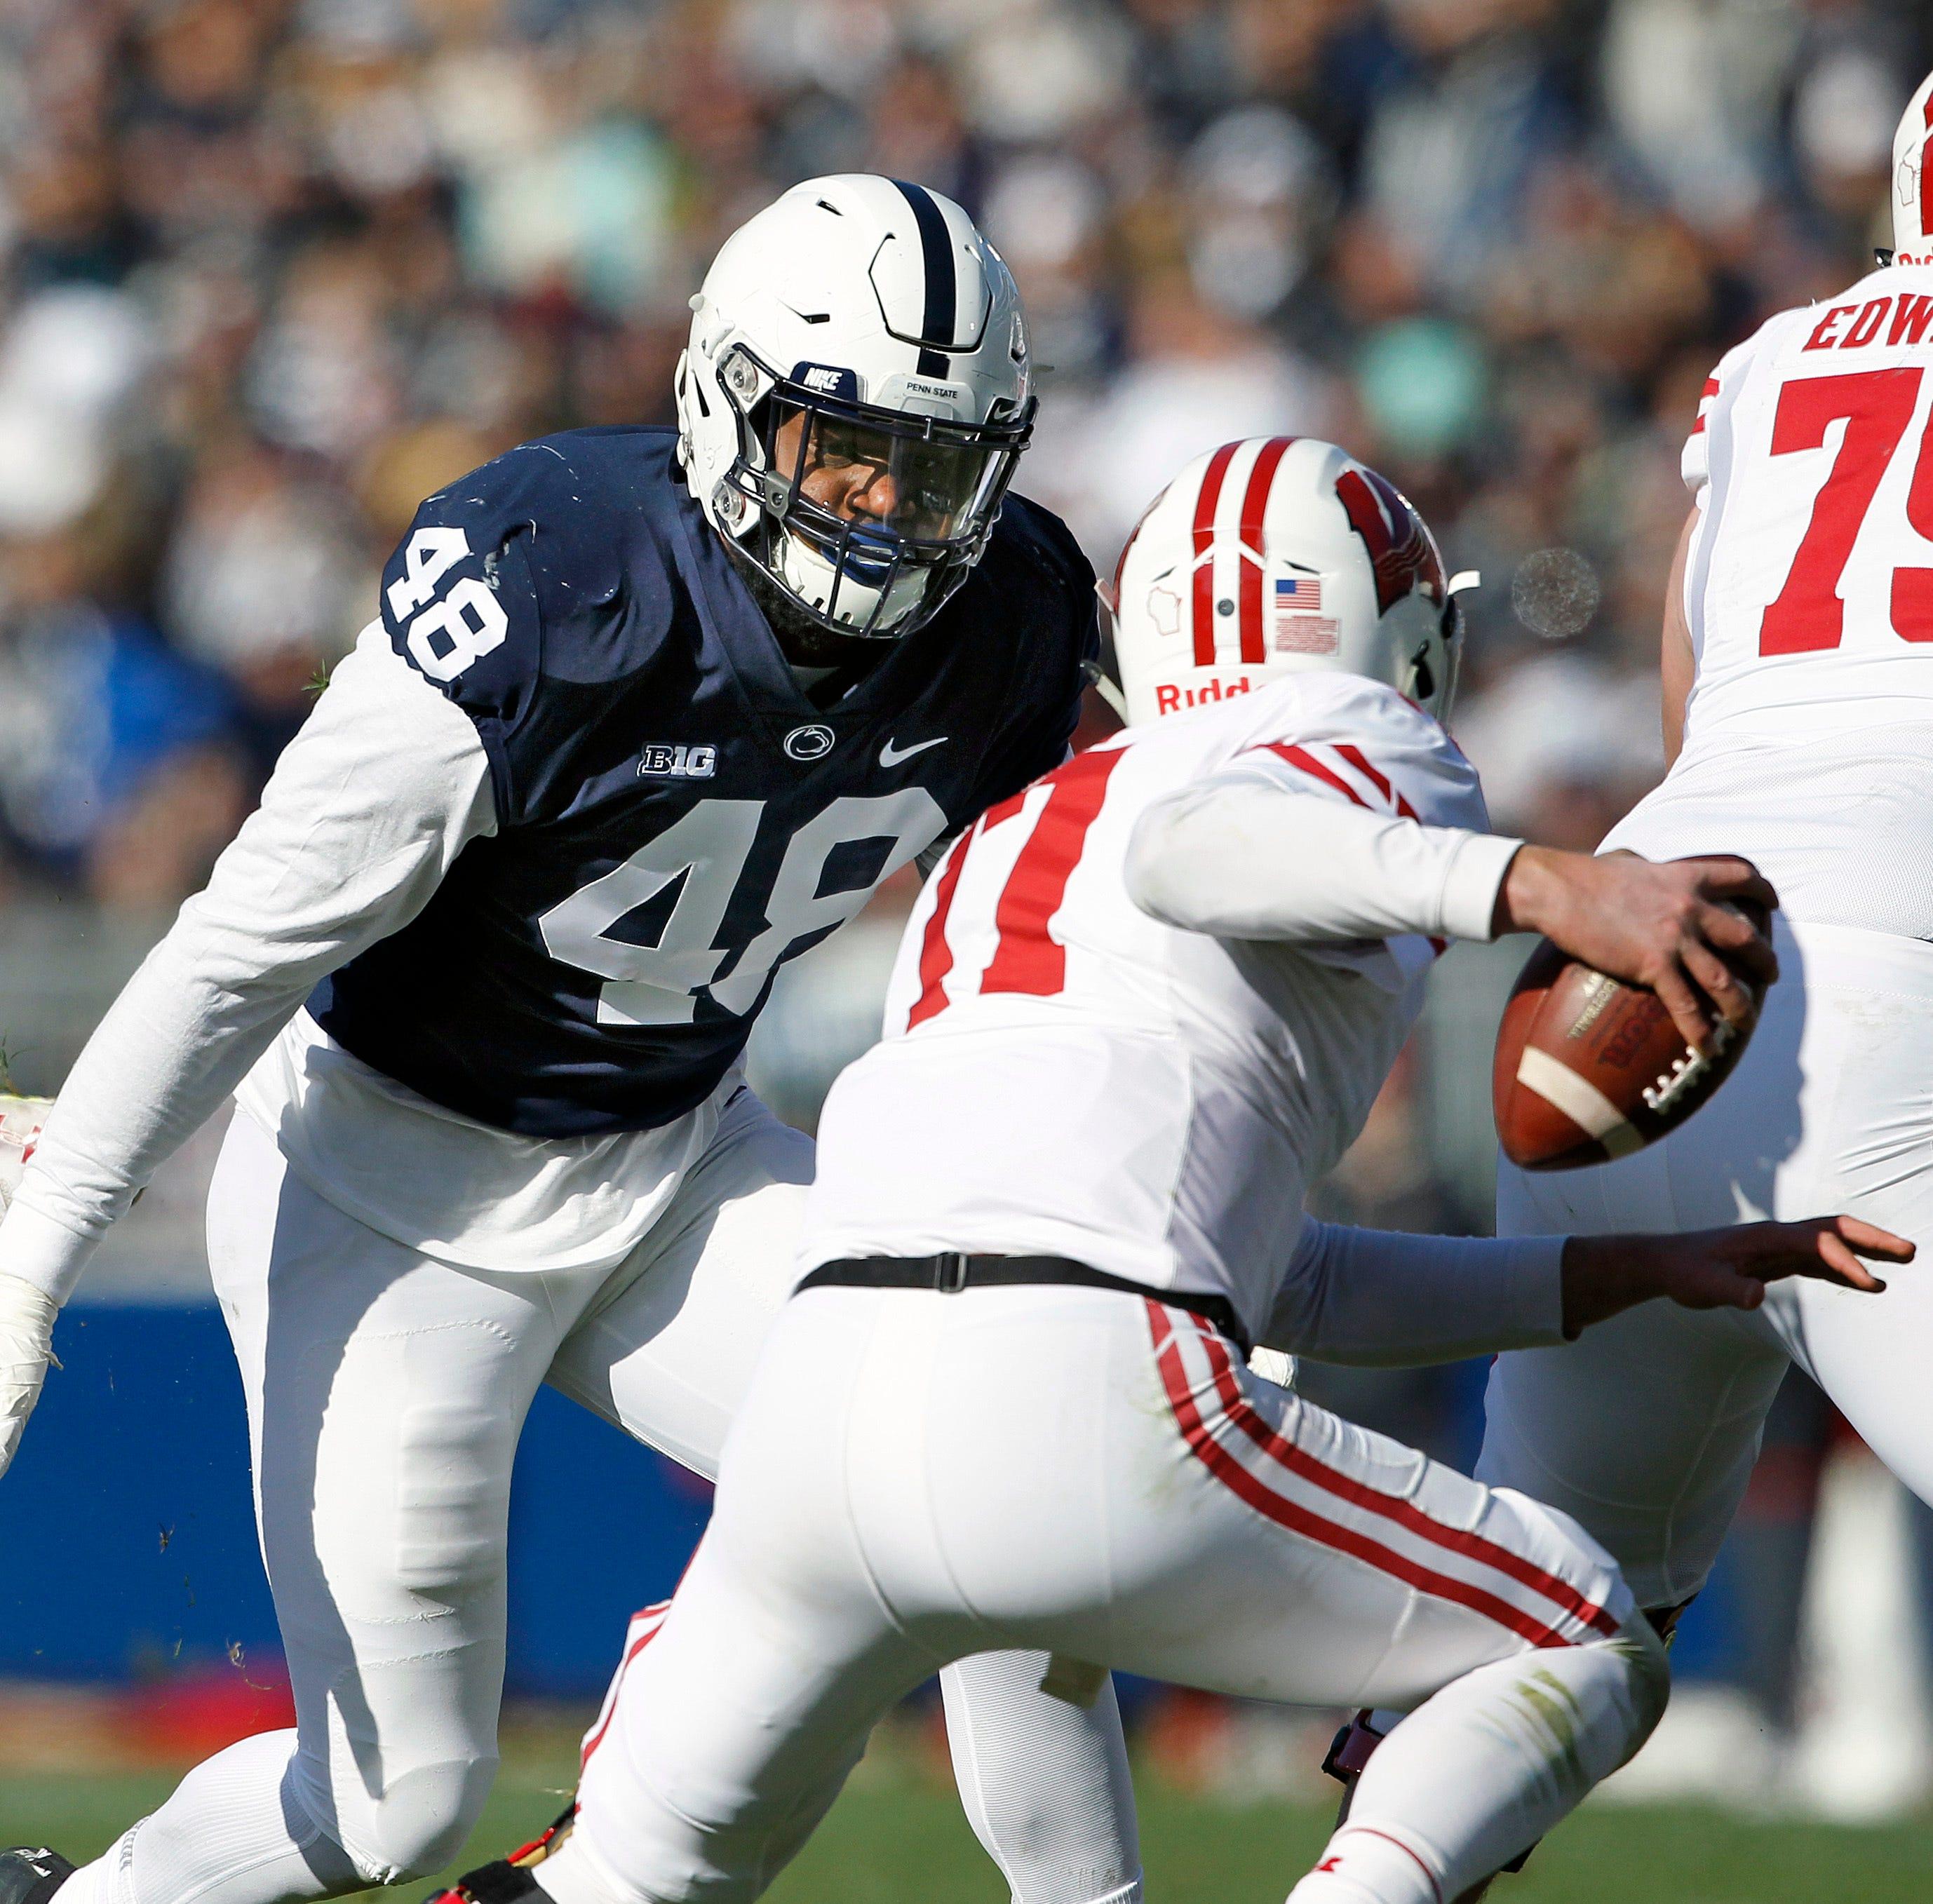 NFL Draft 2019: Don't sleep on Penn State pass rusher Shareef Miller